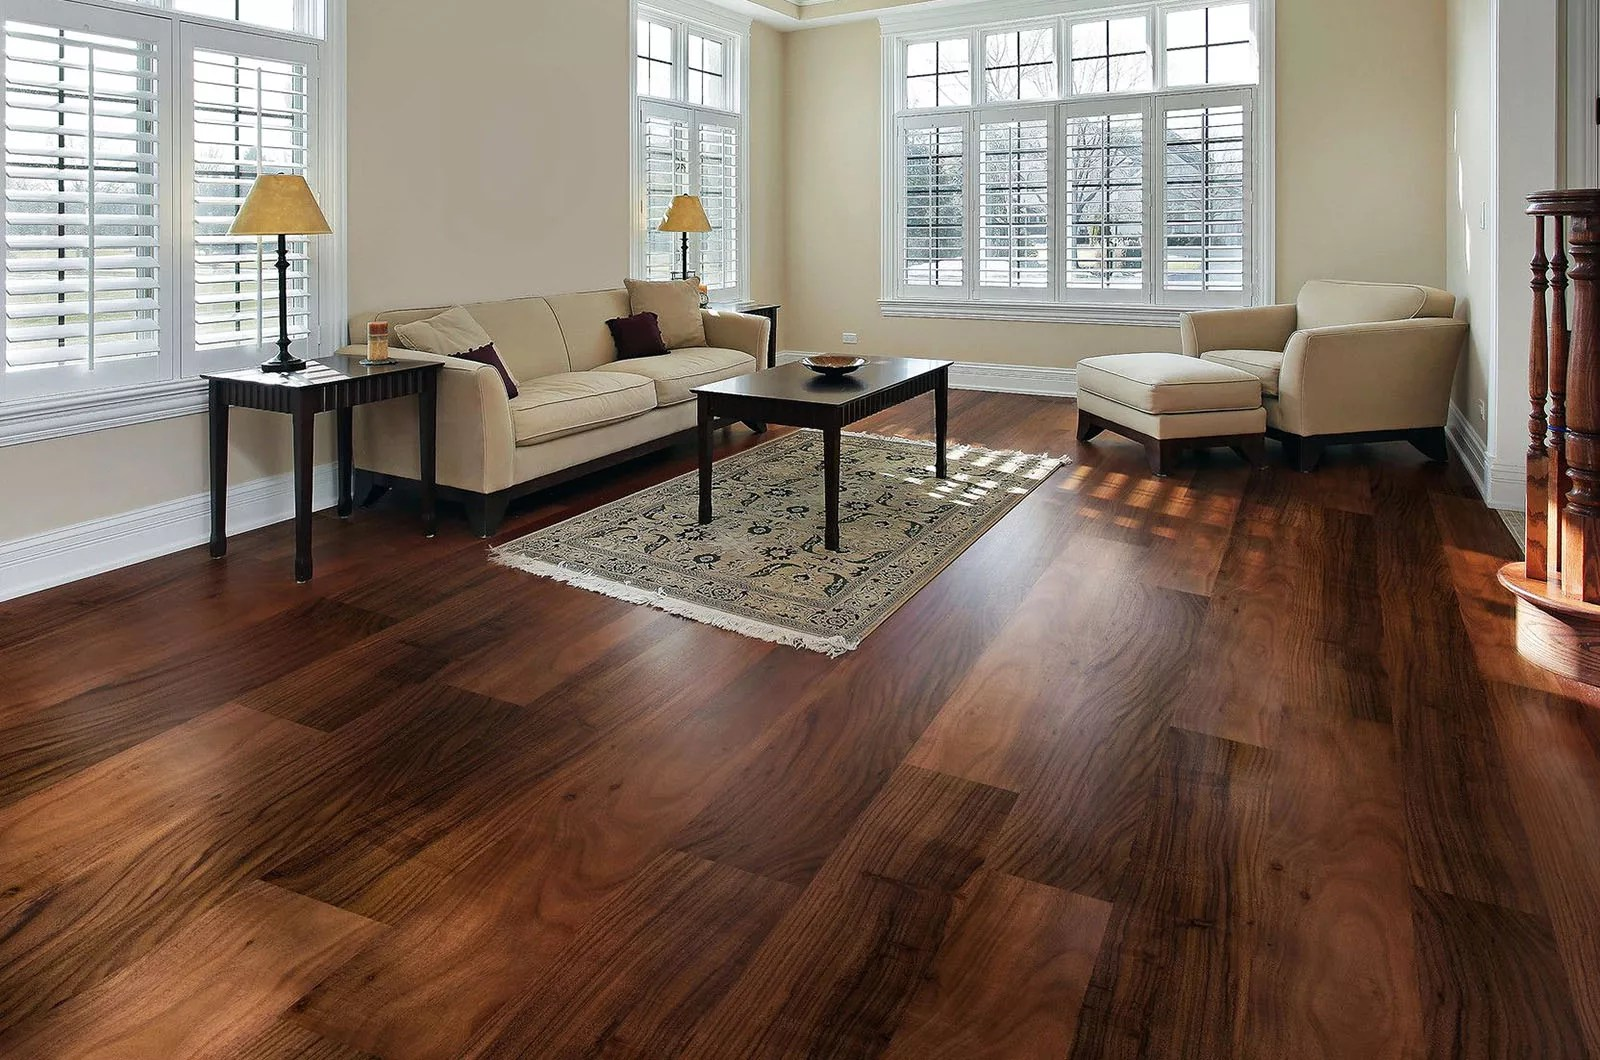 Bulk floor: advantages and disadvantages 20